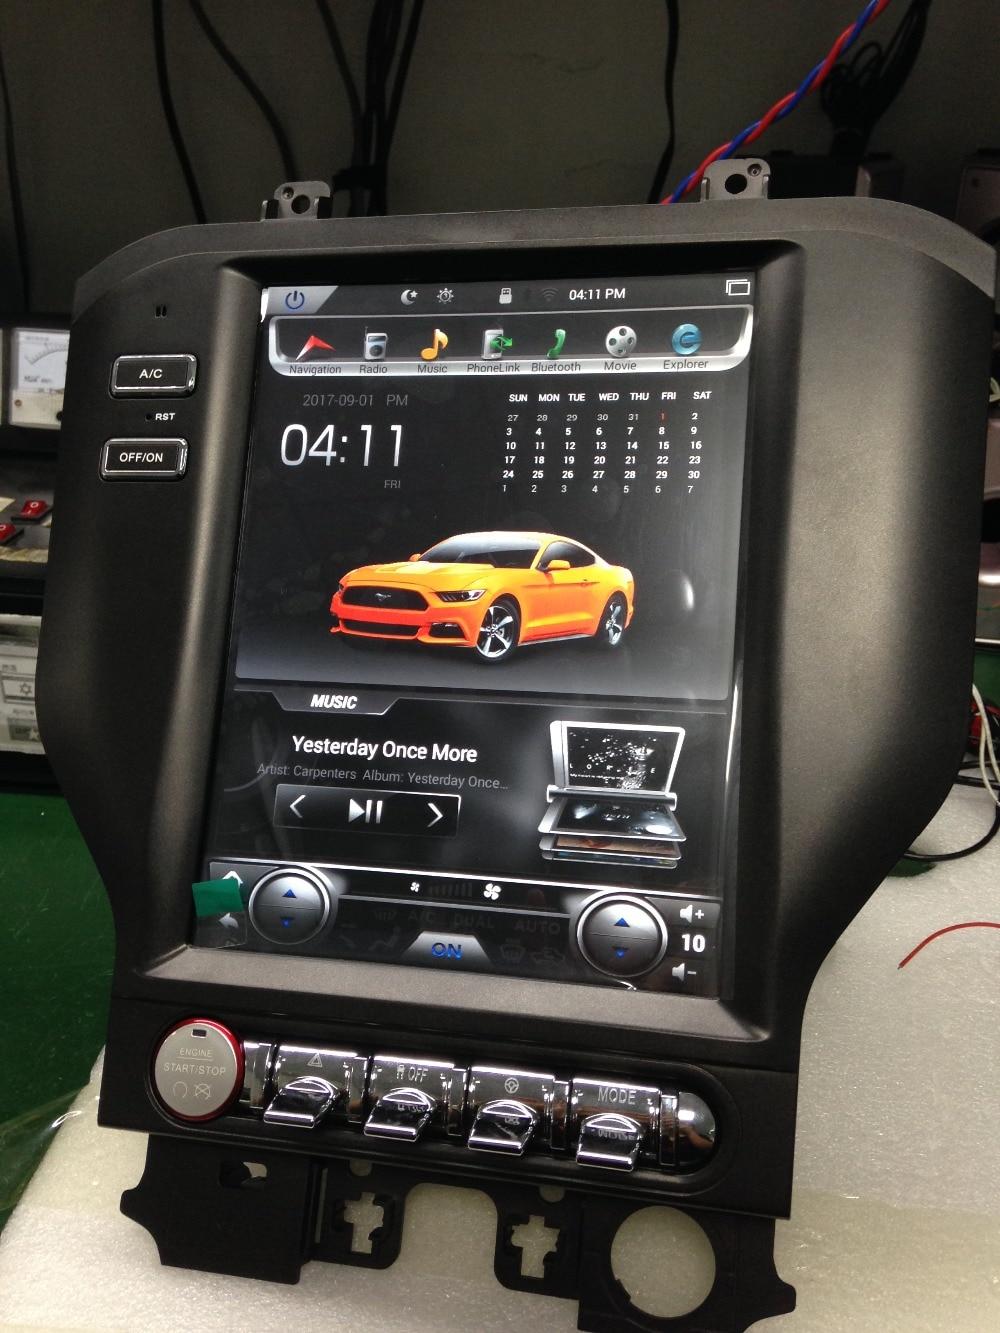 Otojeta Vertical 10.4 Quad Core Android 6.0 2gb ram Car DVD GPS navi radio for Ford Mustang 2015-2016 multimedia audio stereo 2gb ram 7 quad core android 7 1 multimedia 4g dab swc bt car dvd player audio stereo radio gps navi for vw touareg 2002 2011